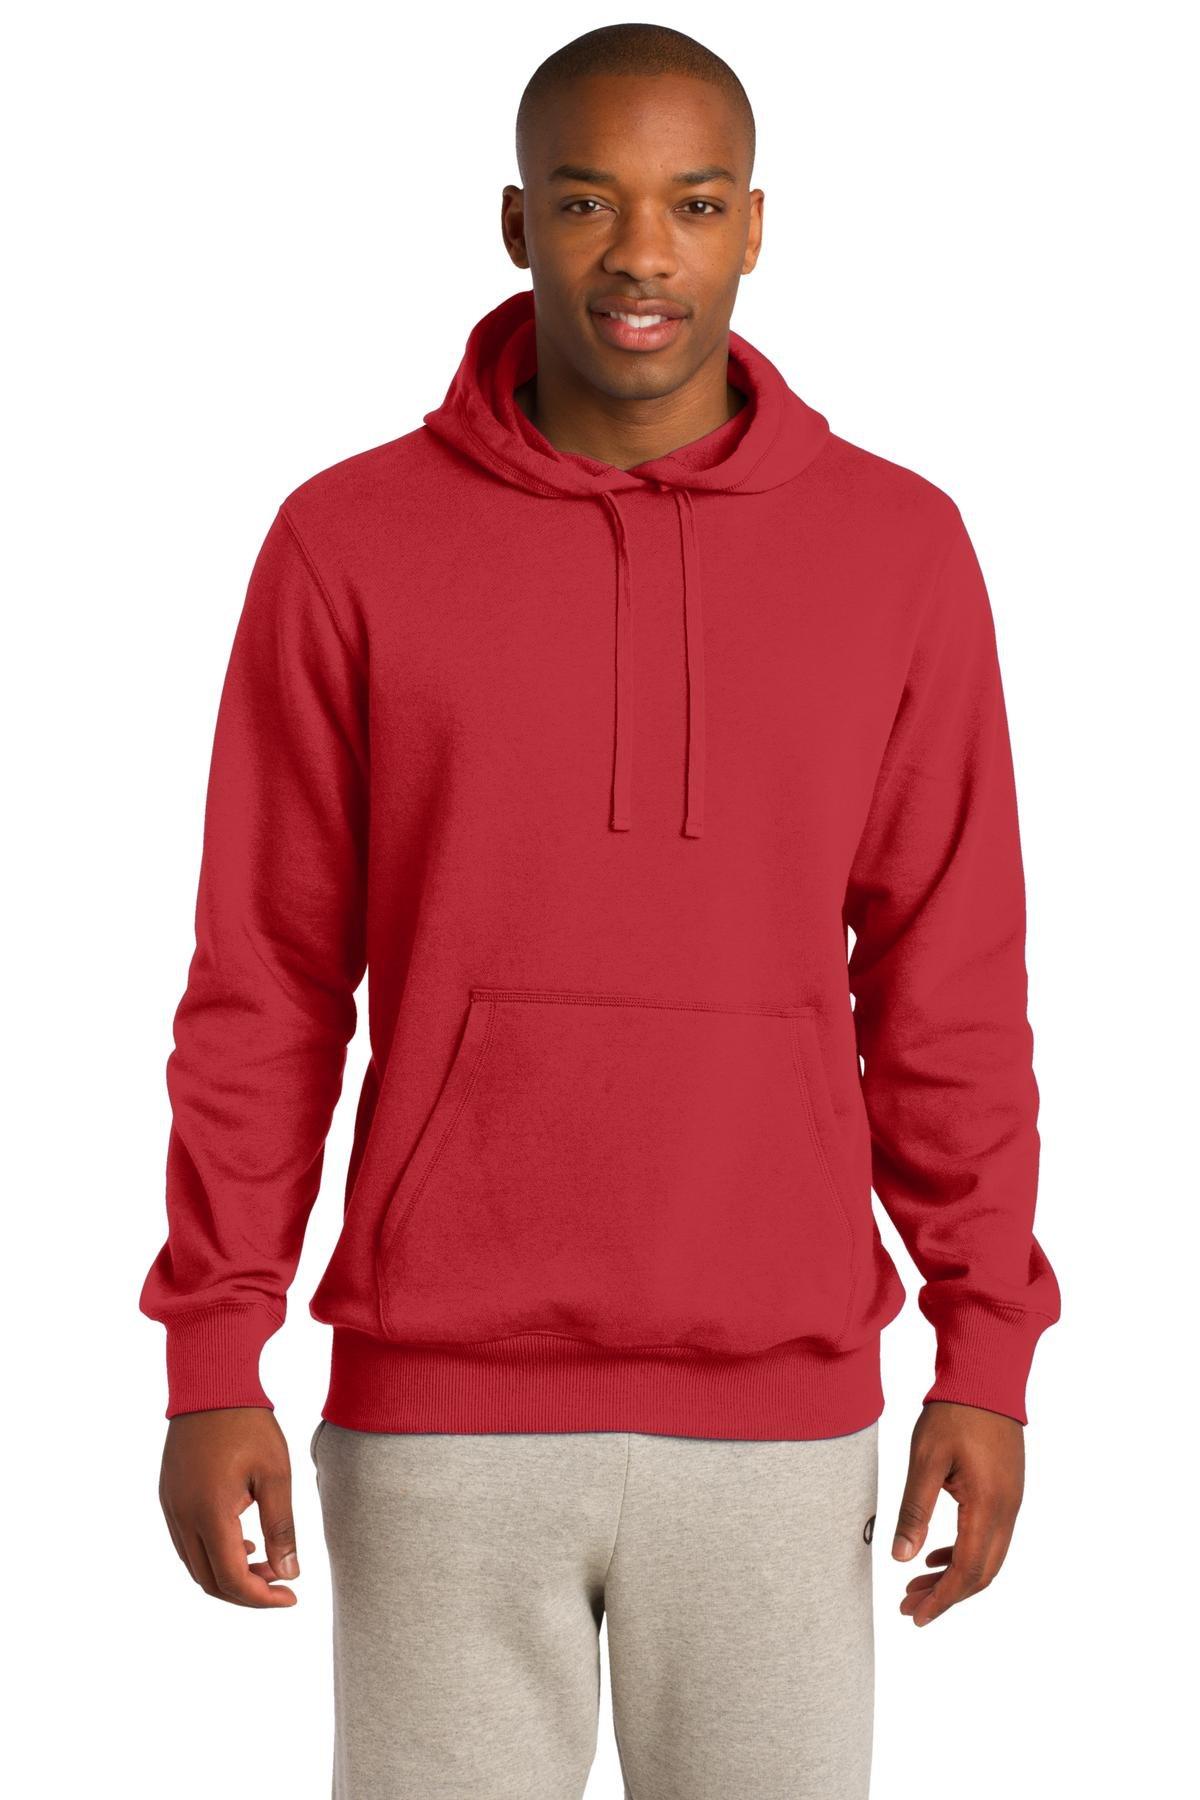 Sport-Tek Pullover Hooded Sweatshirt. - Small - True Red by Sport-Tek